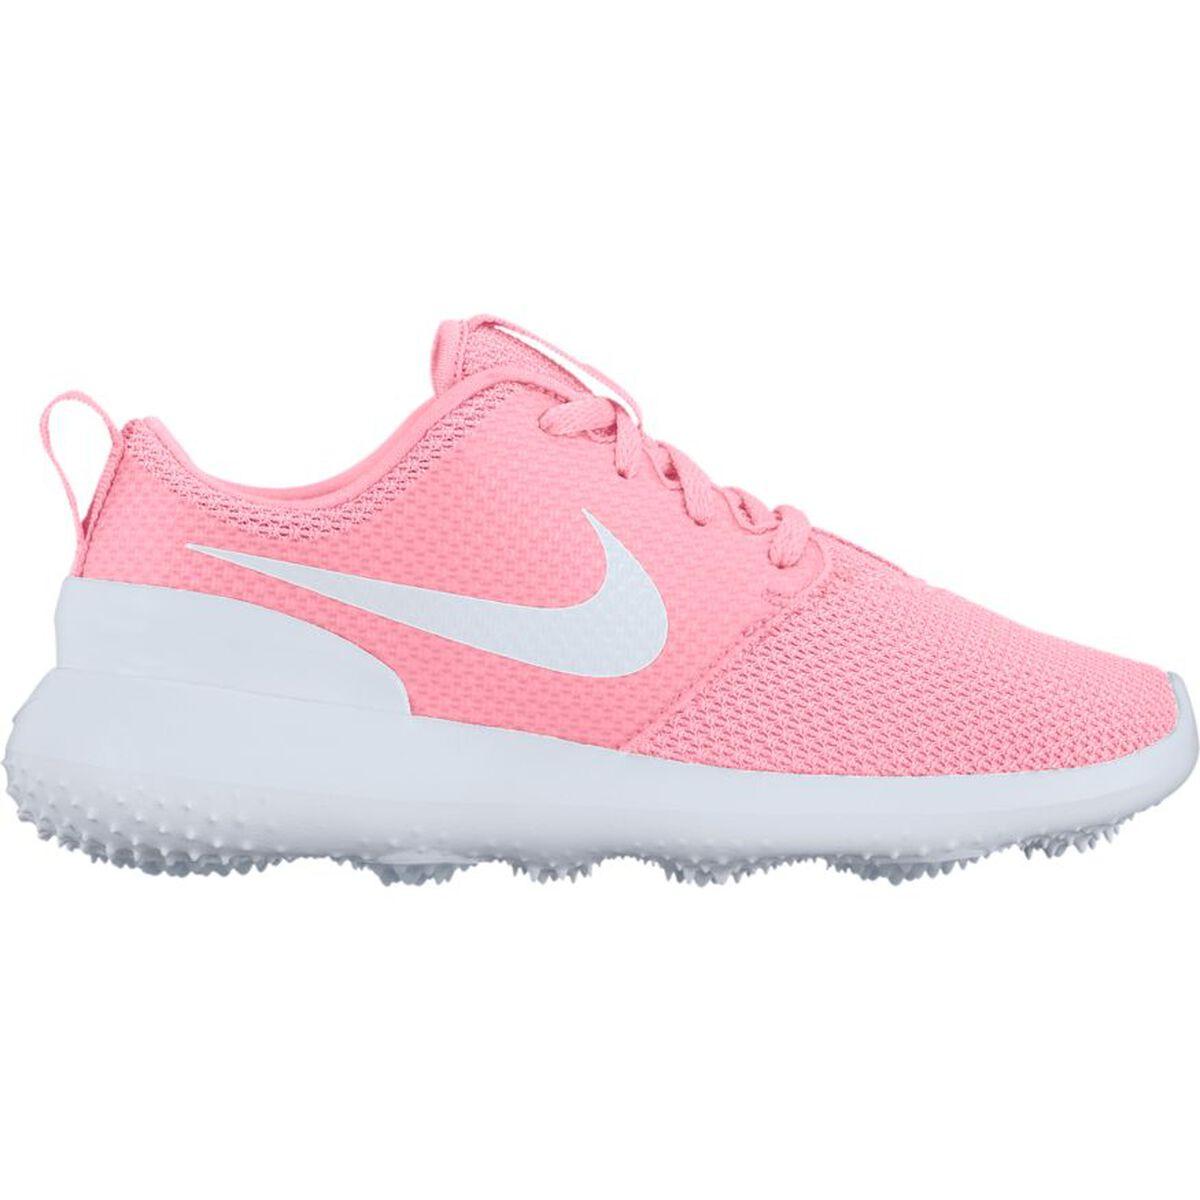 Nike Roshe G Junior Golf Shoe - Pink b31164dd7